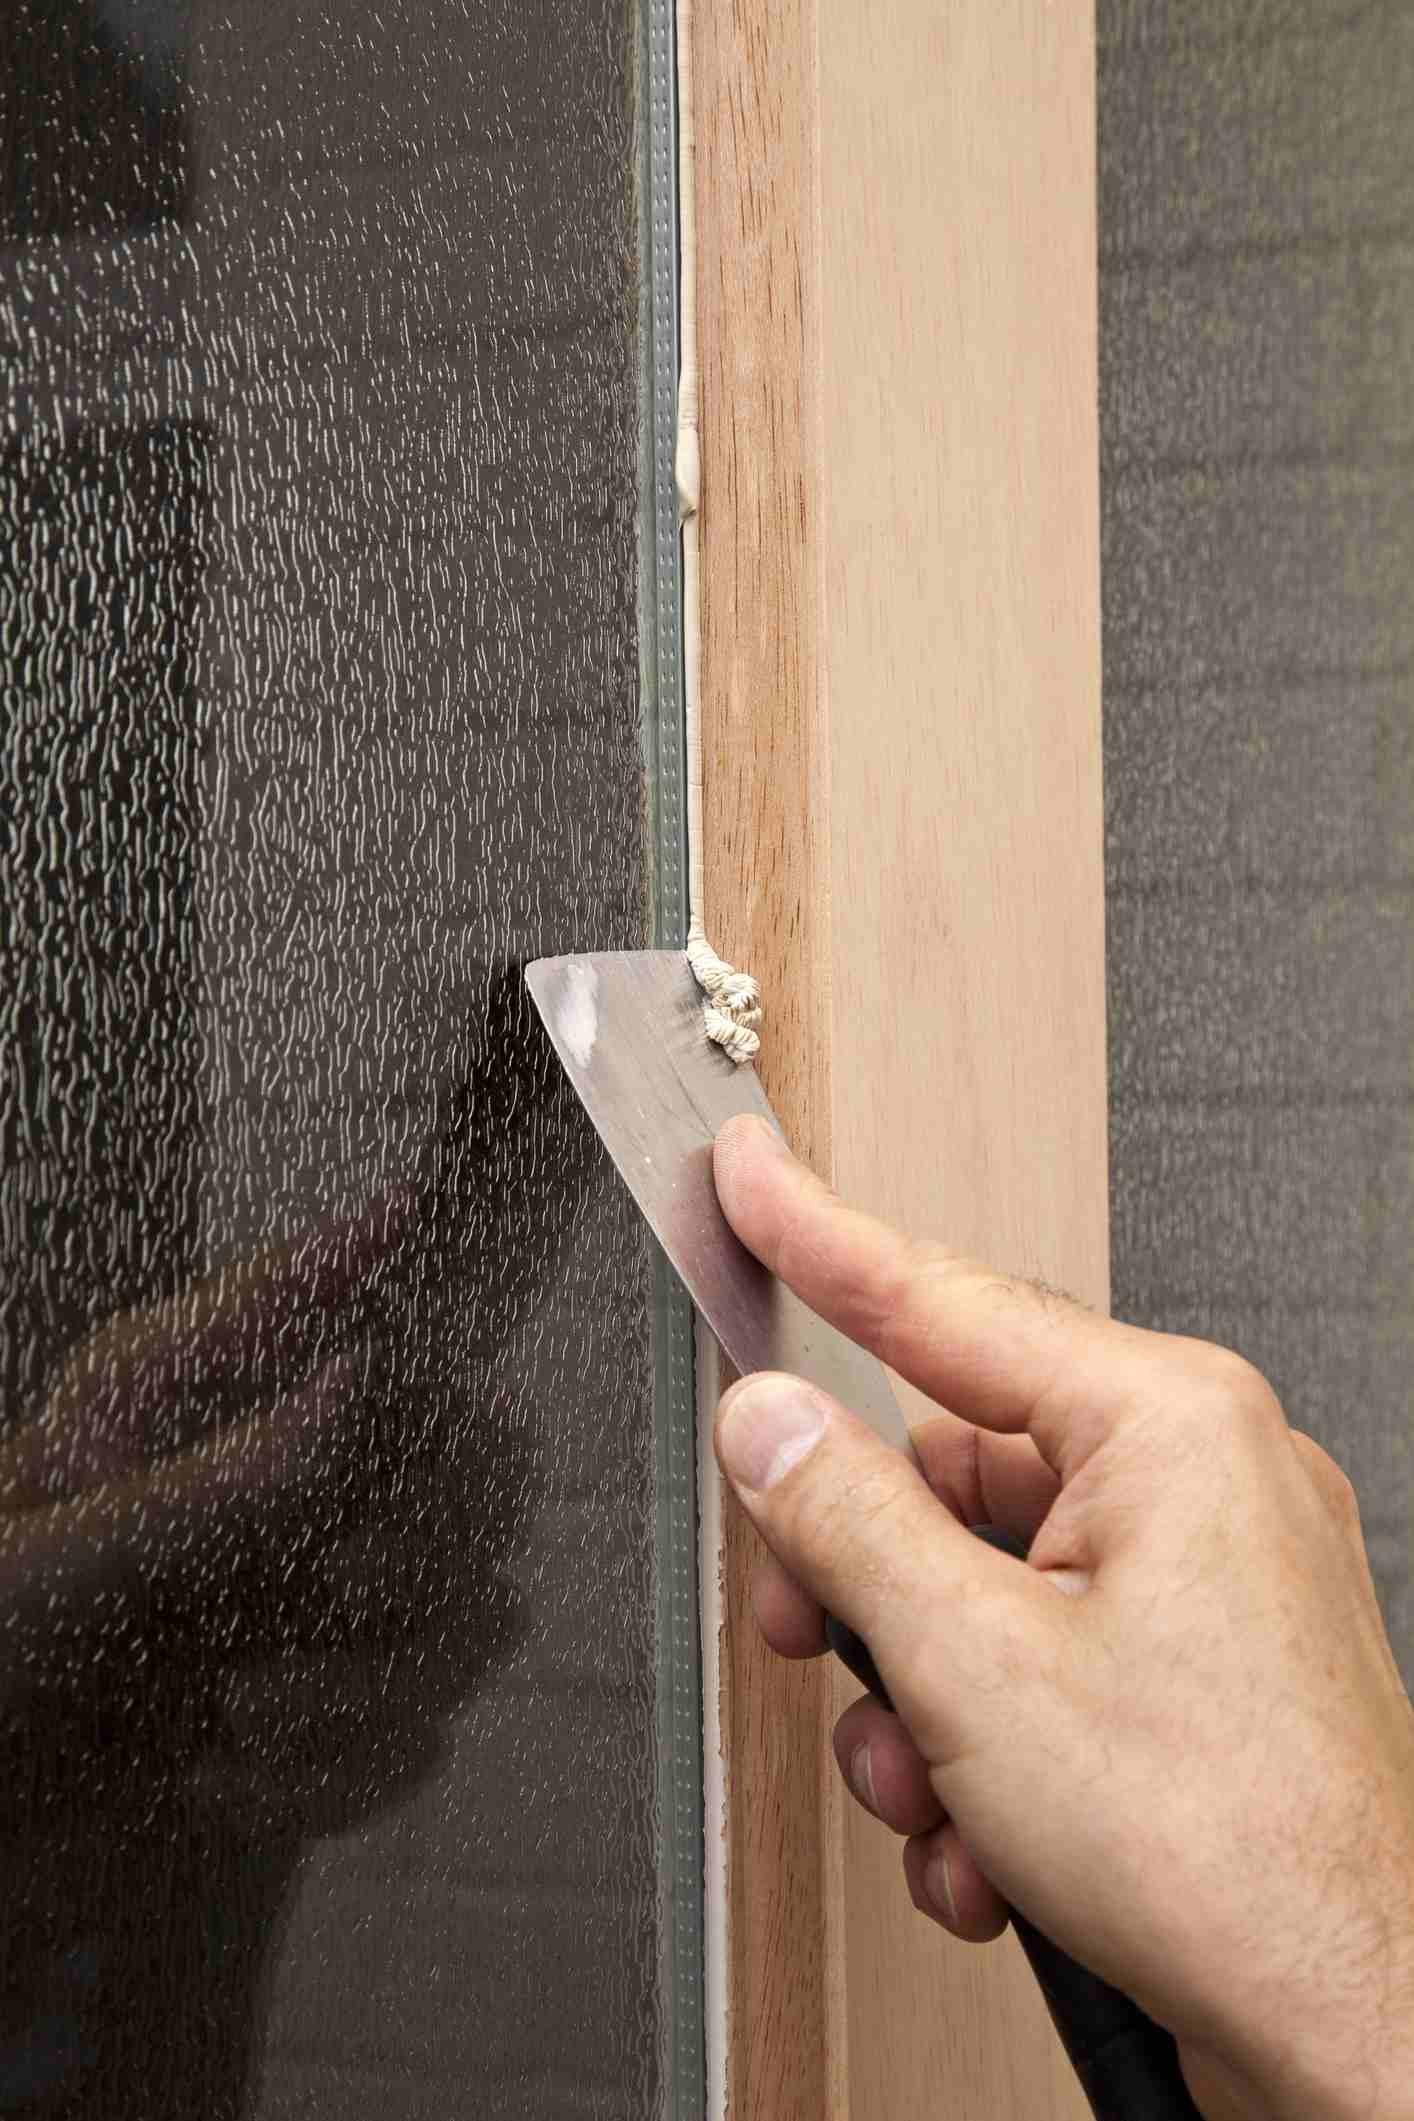 A hand removing glazier putty with a scraper